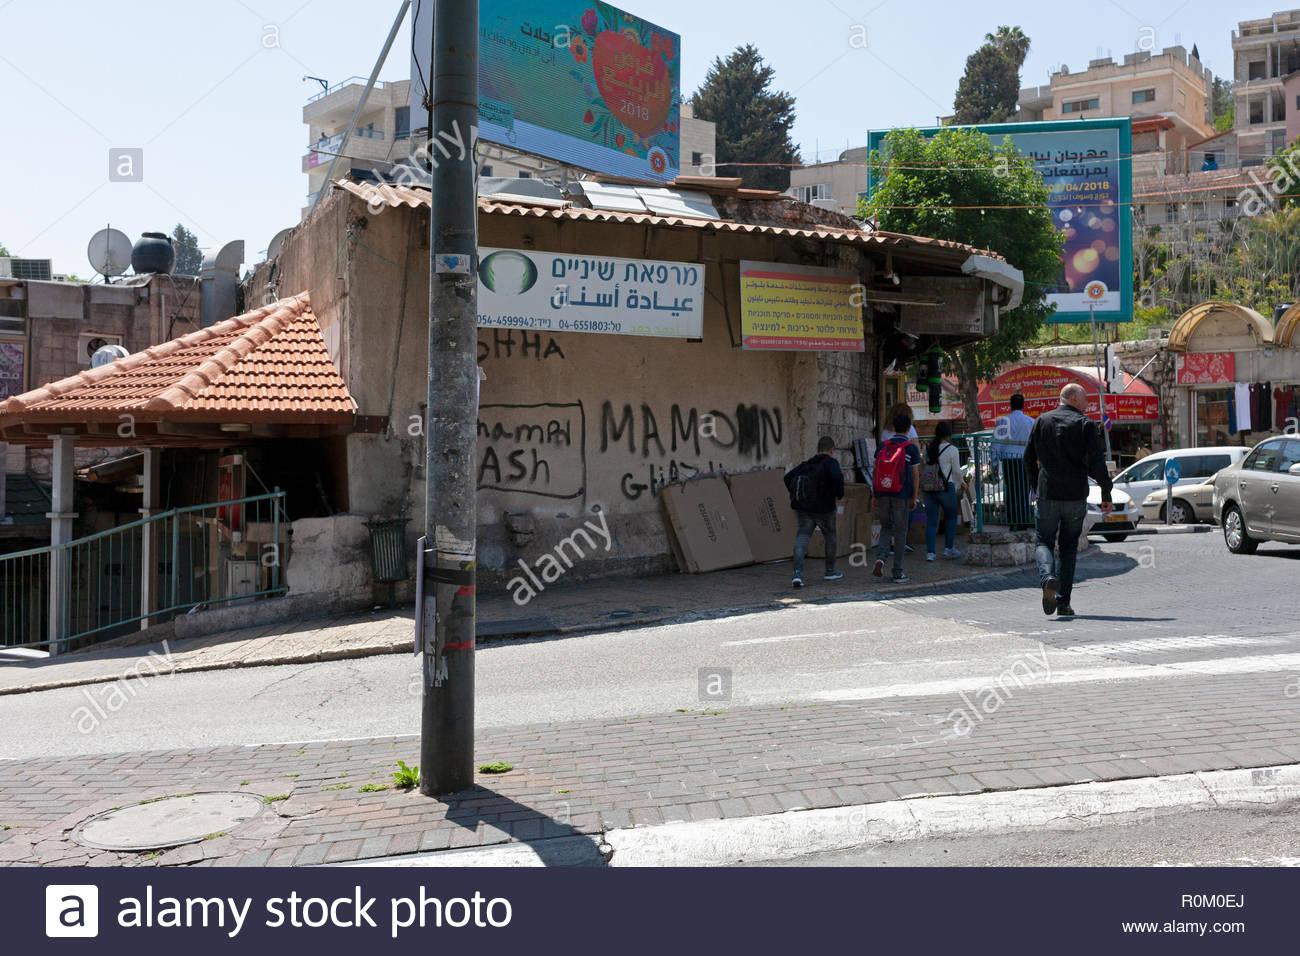 Street Corner in Nazareth Israel 2018 - Stock Image